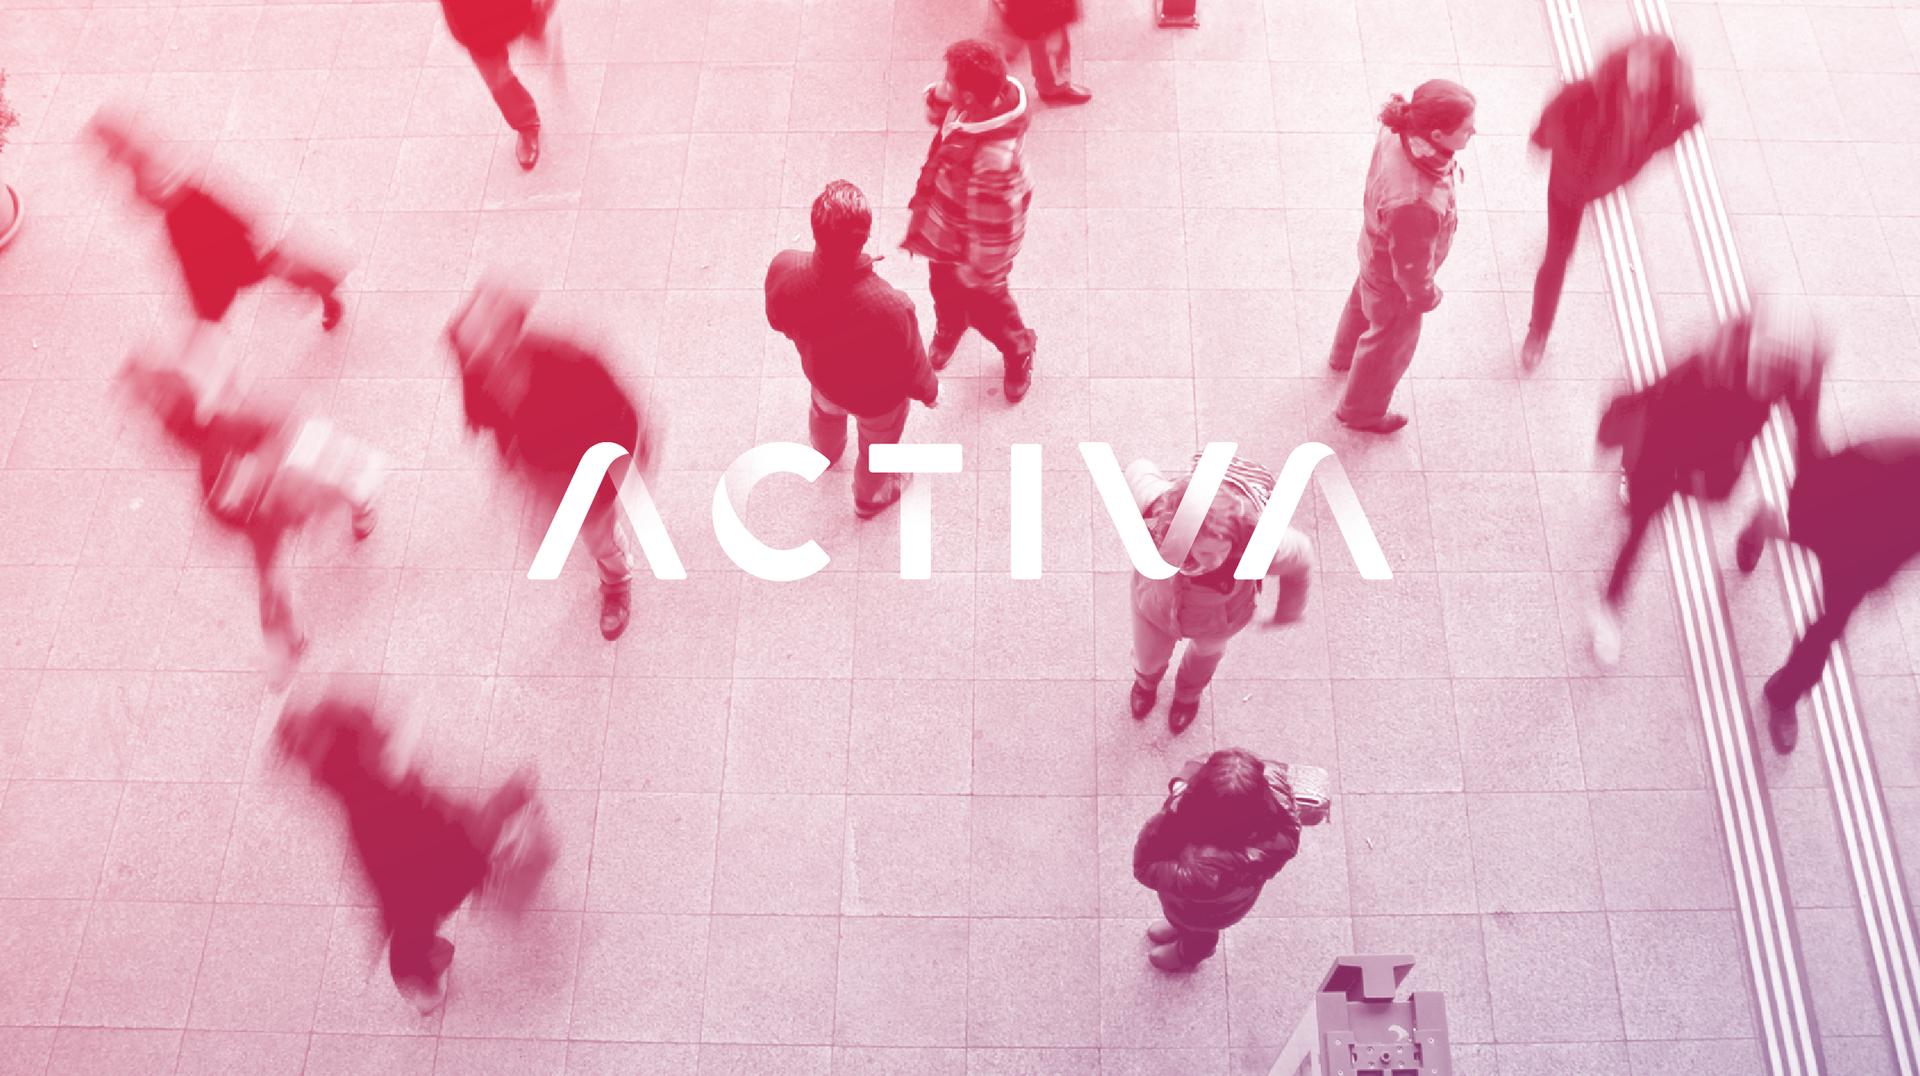 activa_fondo-02-02.png